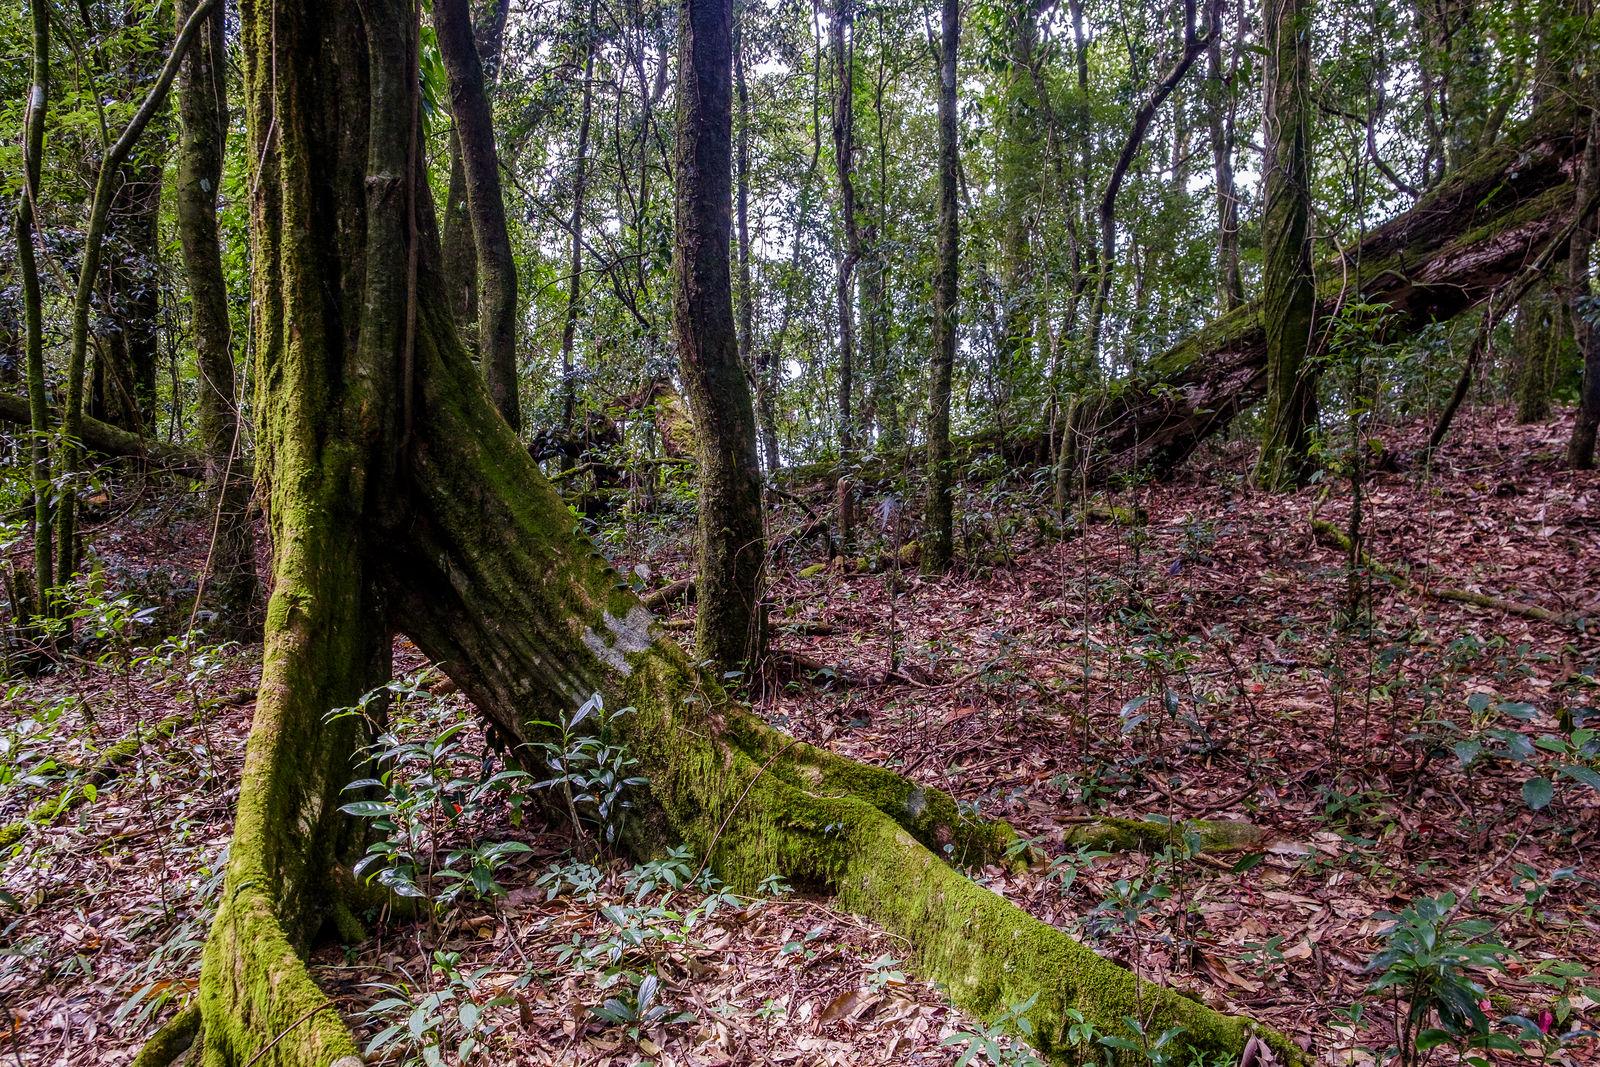 Sacred forest shillong